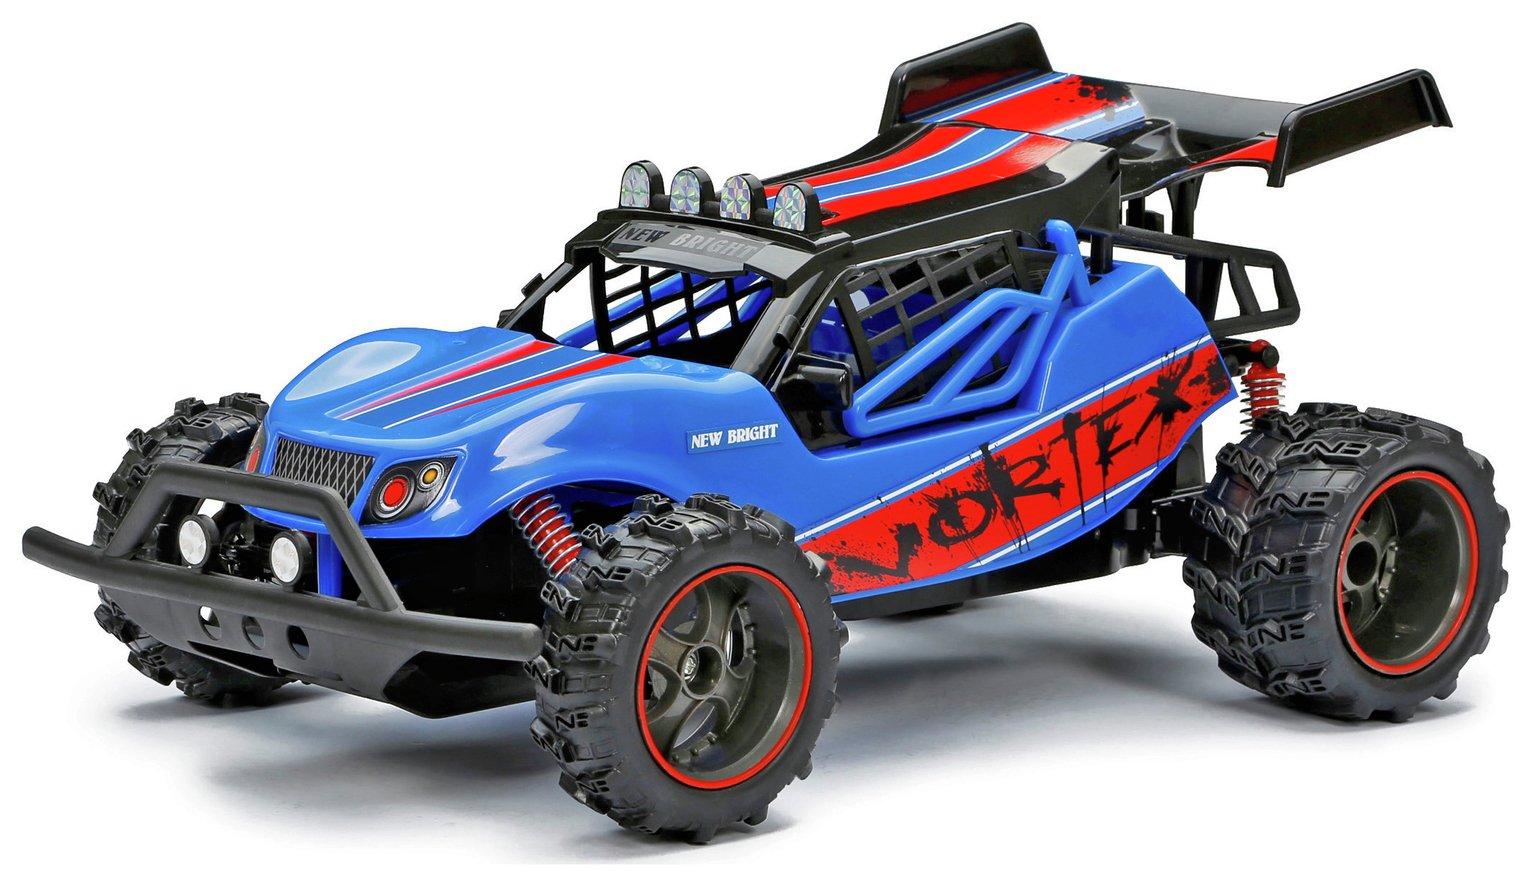 New Bright RC 1:14 Vortex Buggy